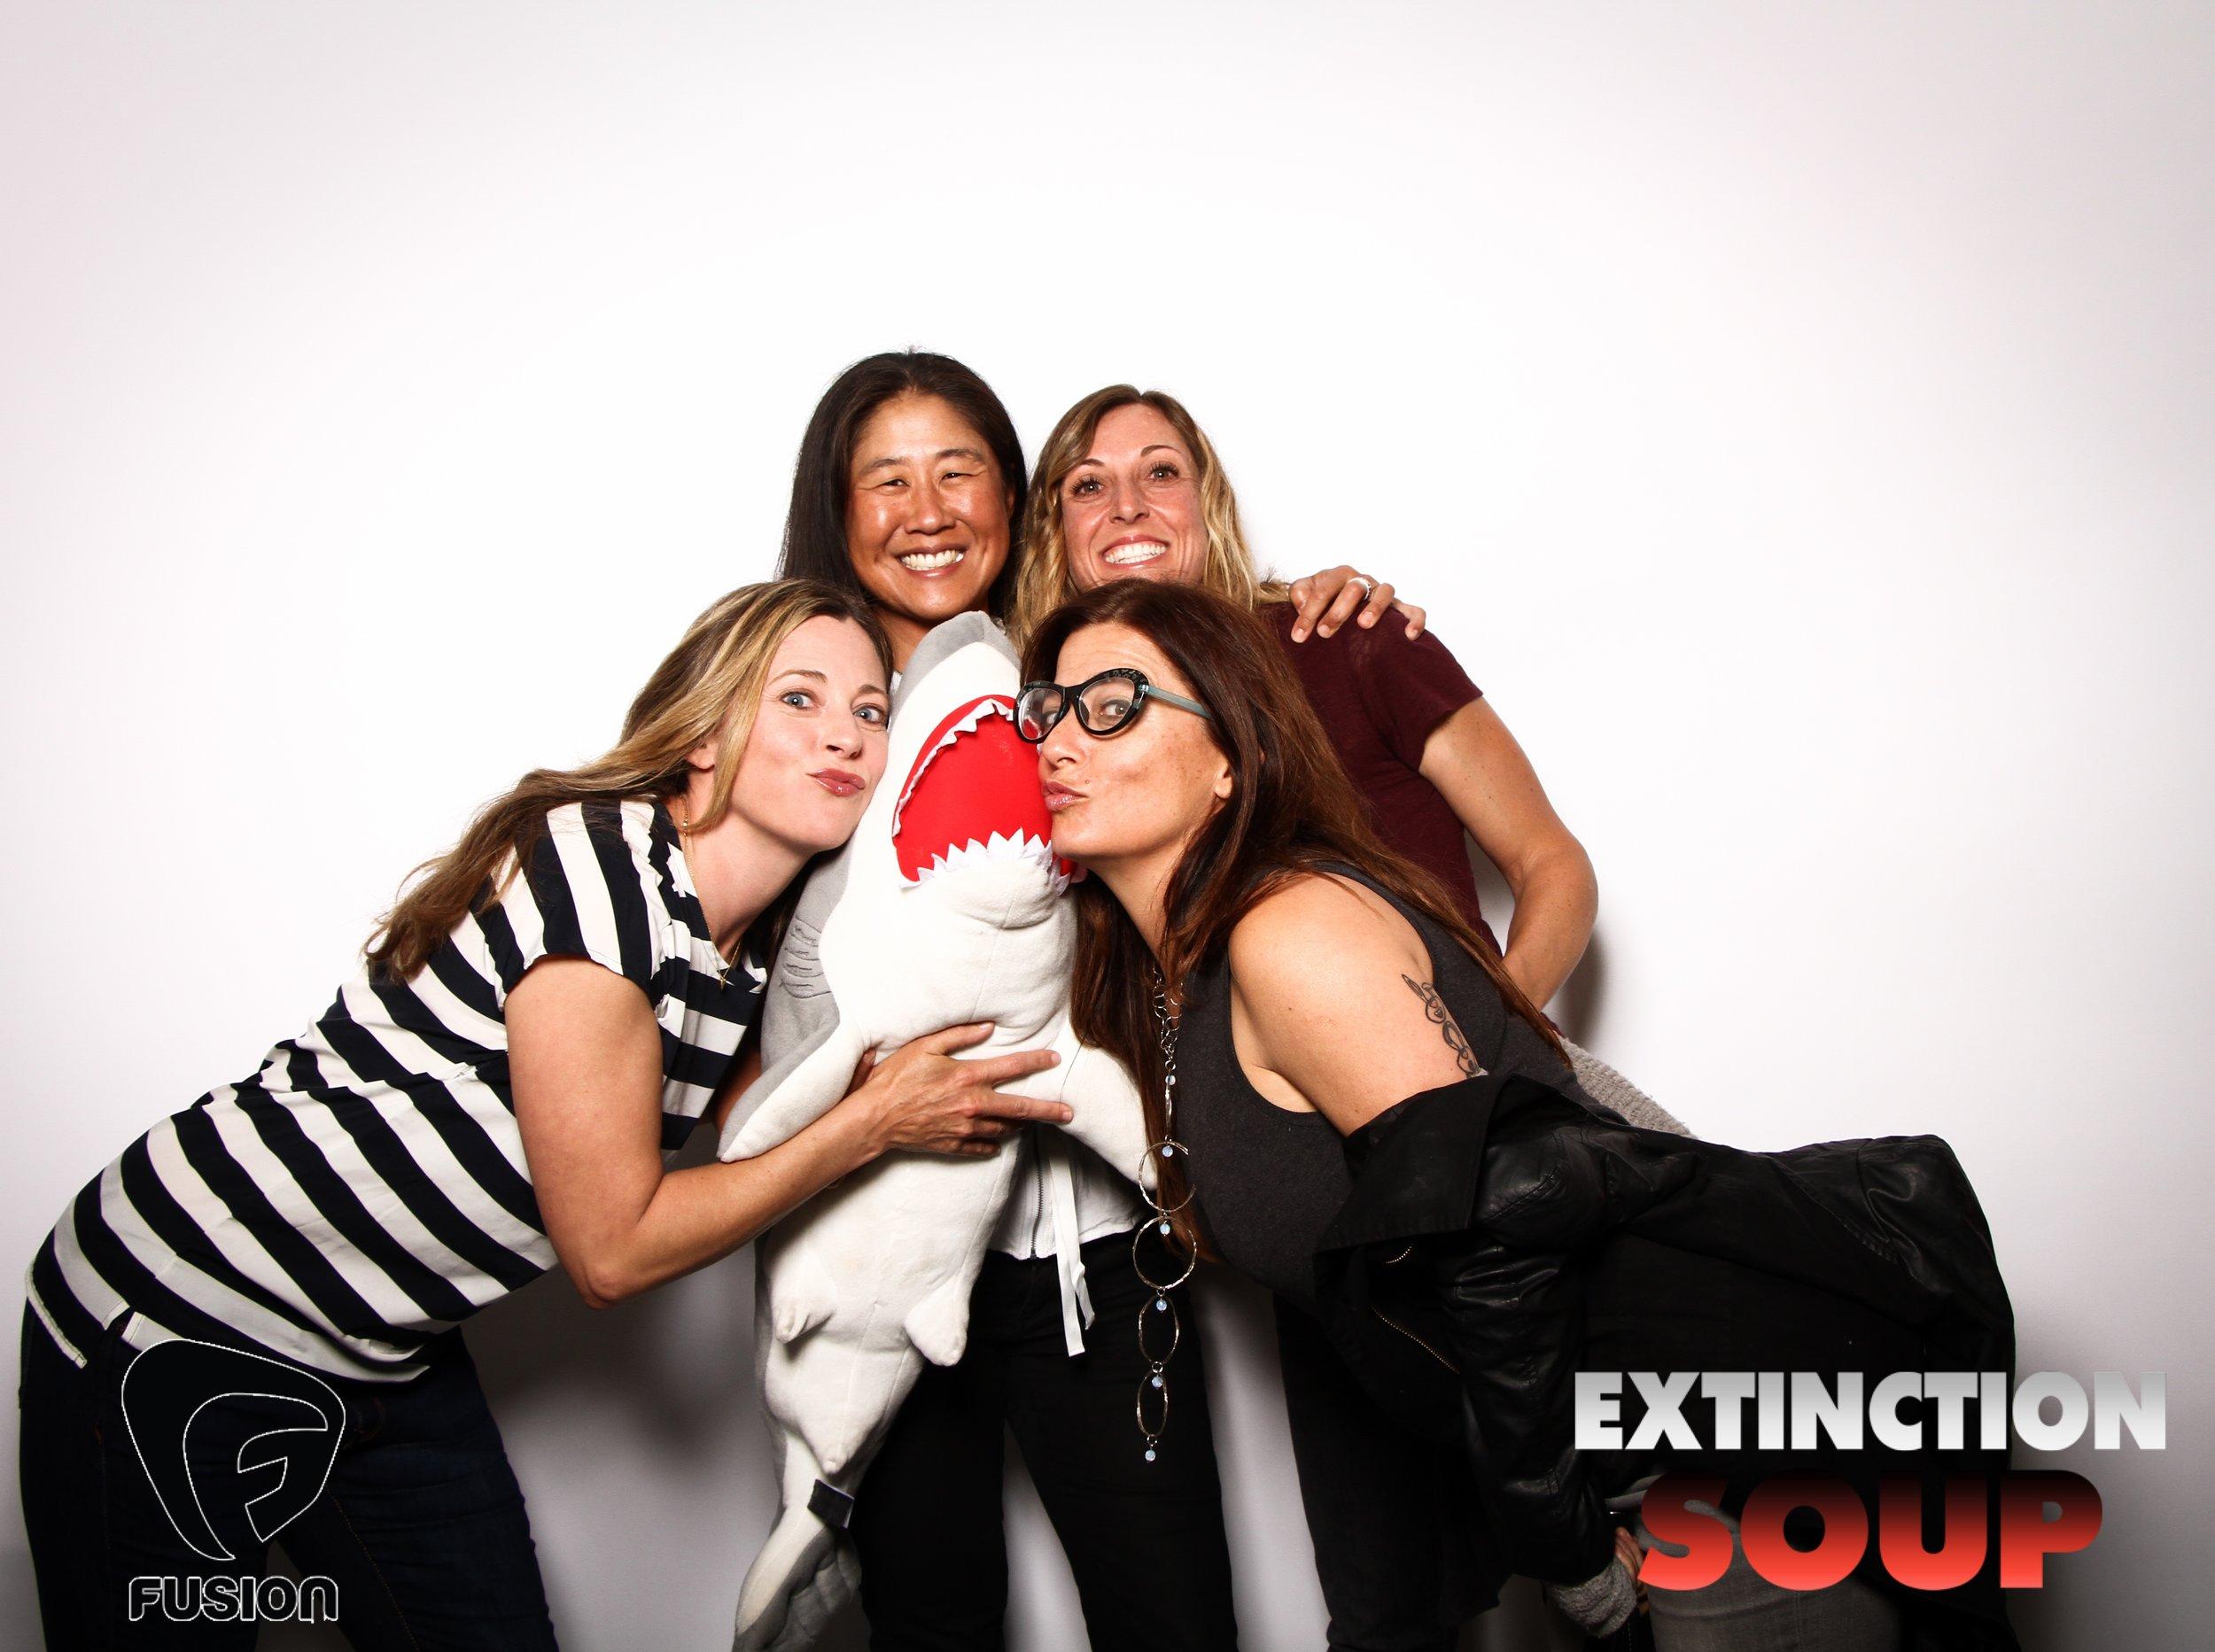 Photo booth fun with shark 6